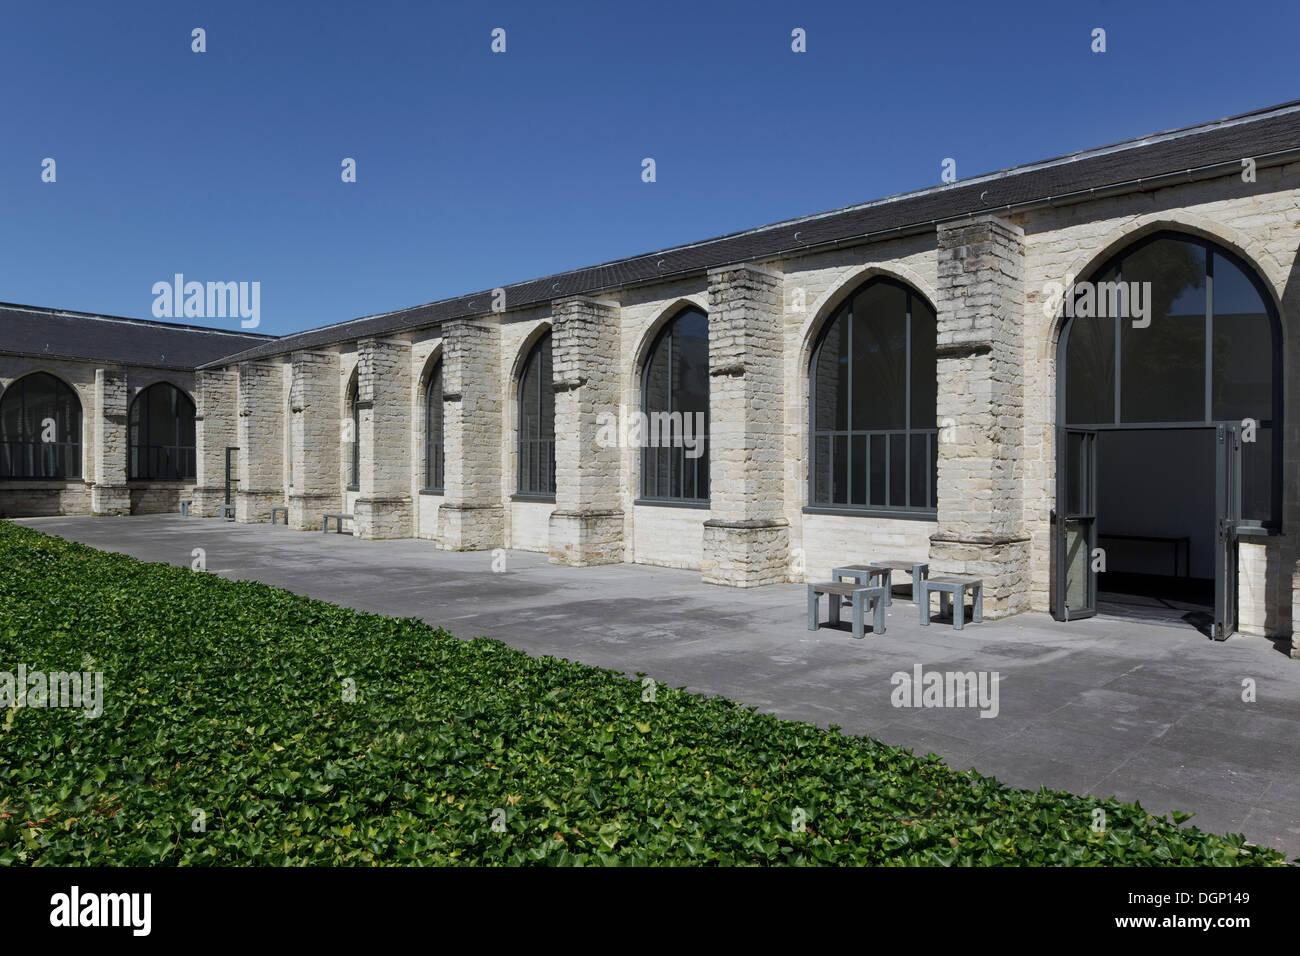 Catholic University of Leuven Arenberg Library, Leuven, Belgium. Architect: Rafael Moneo, 2002. Exterior of cloister against cle - Stock Image